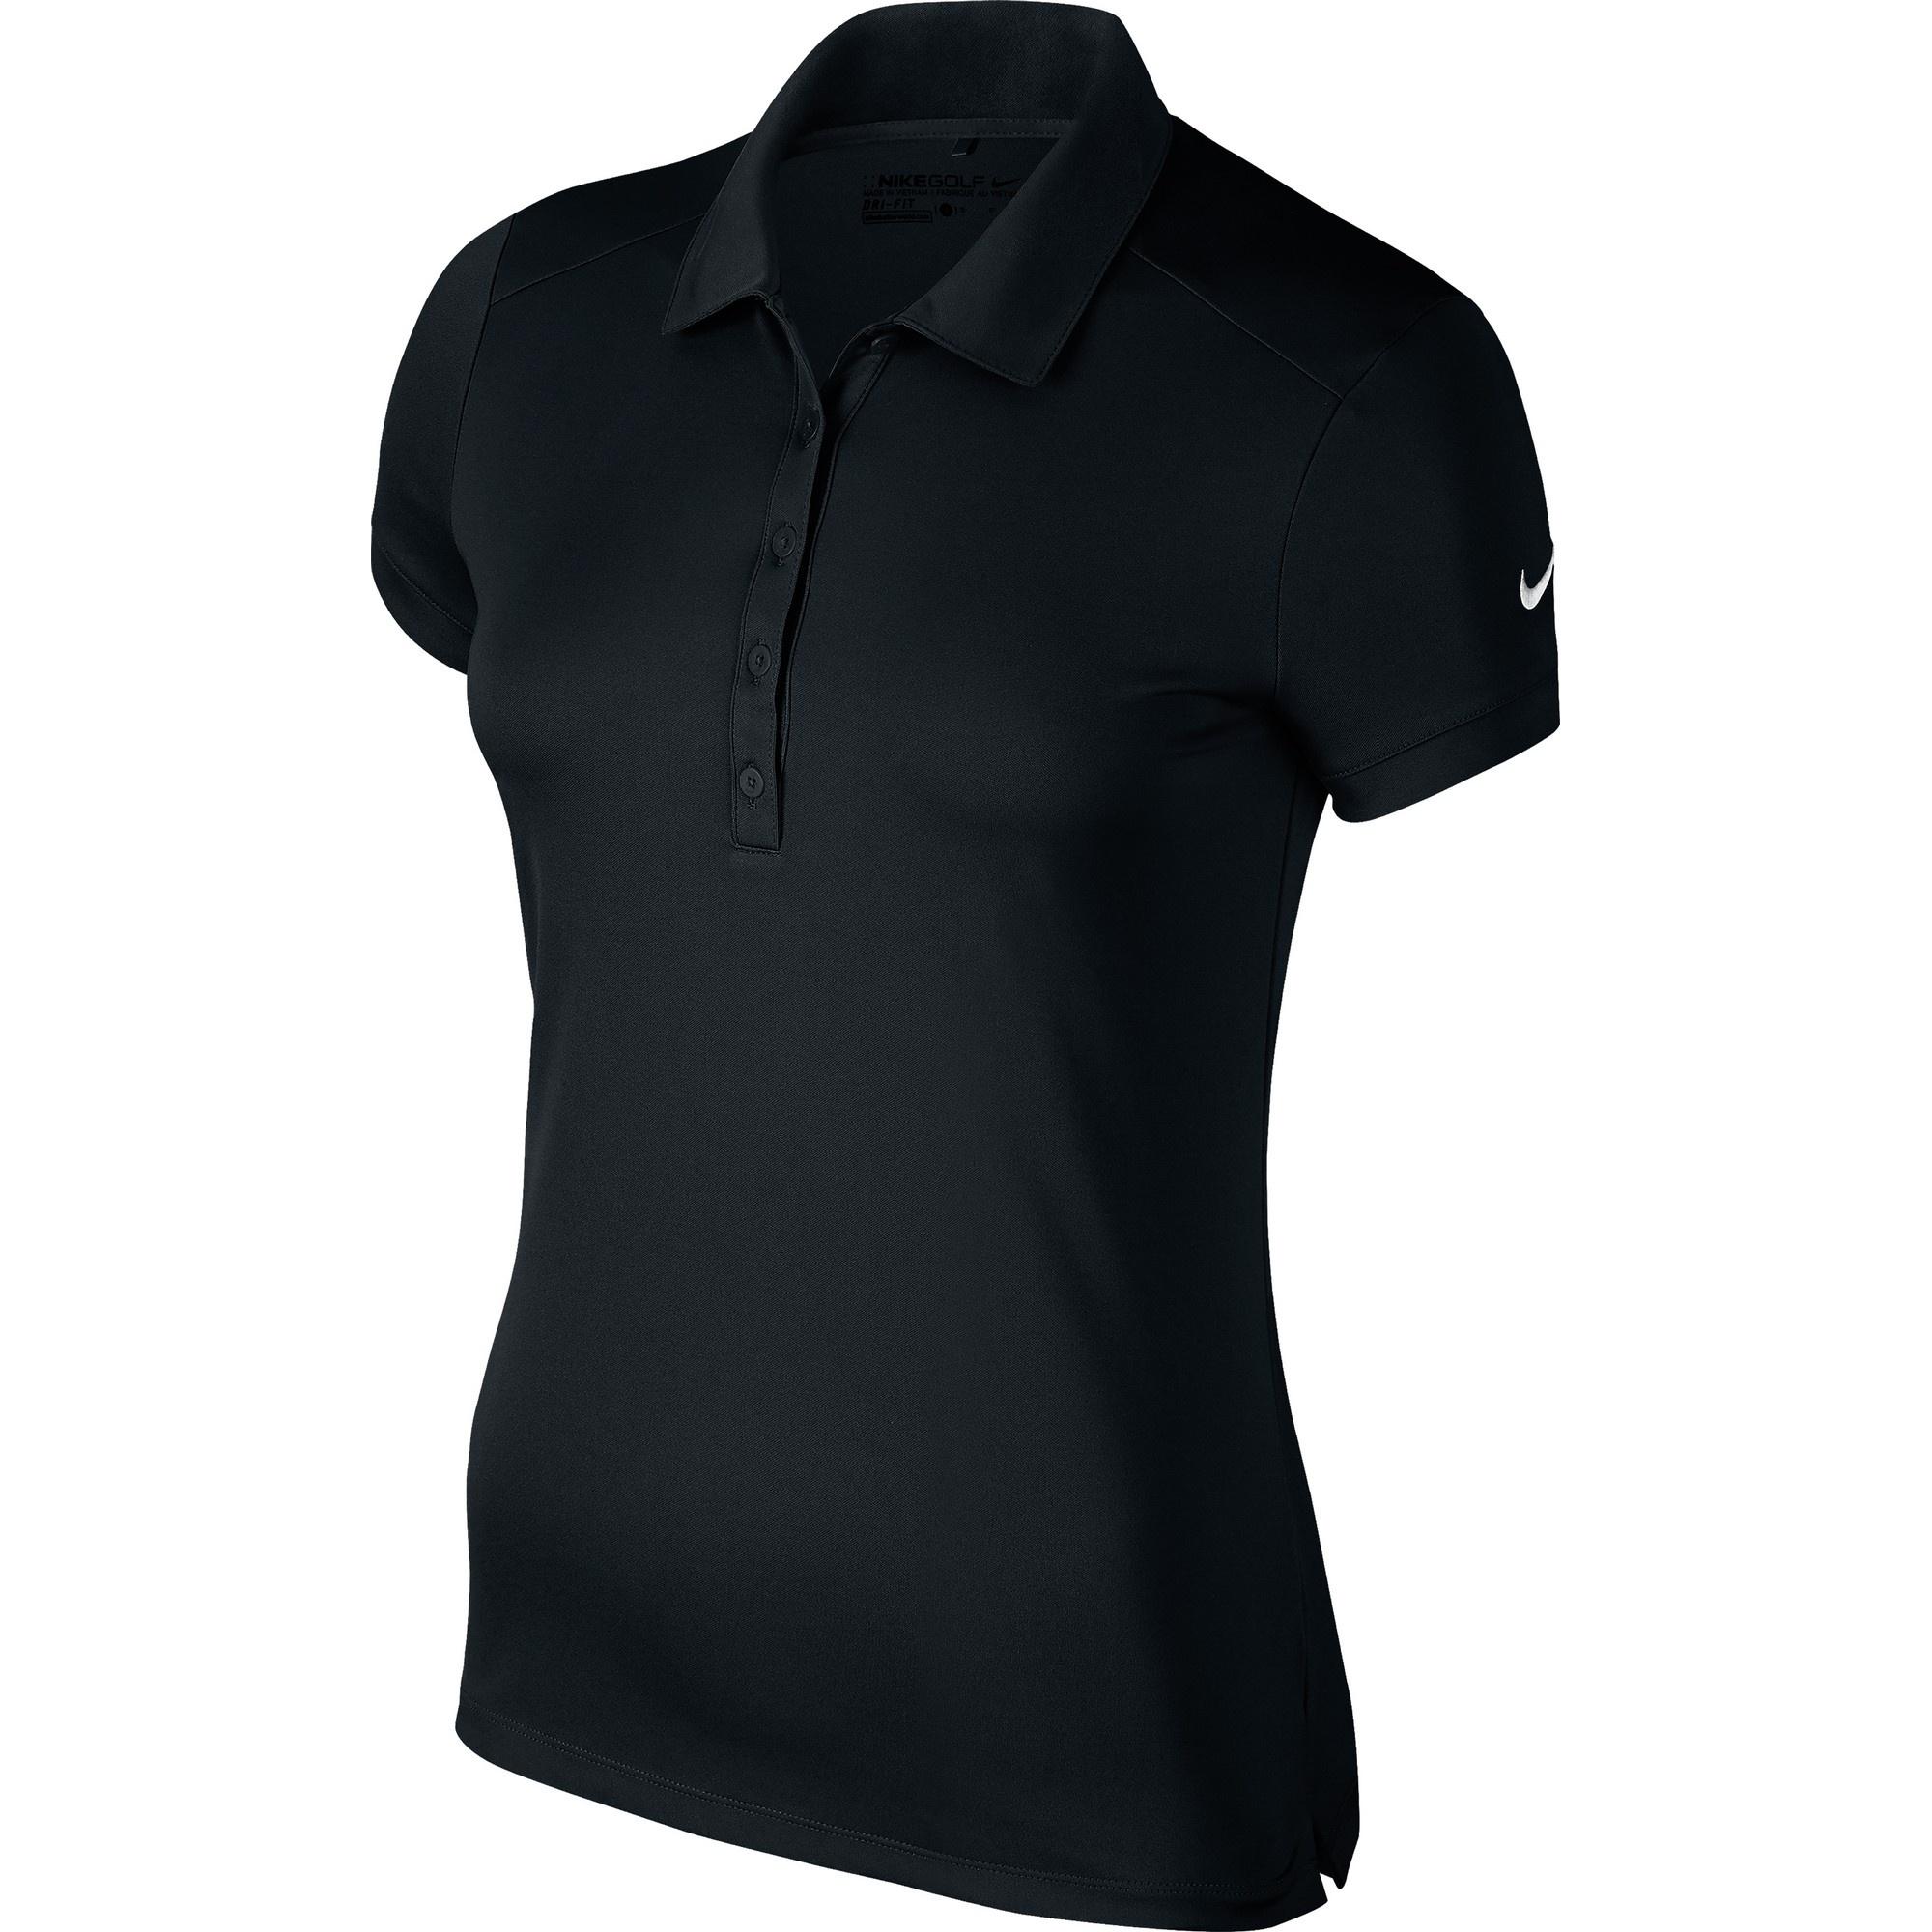 Nike Womens/Ladies Victory Short Sleeve Solid Polo Shirt ...